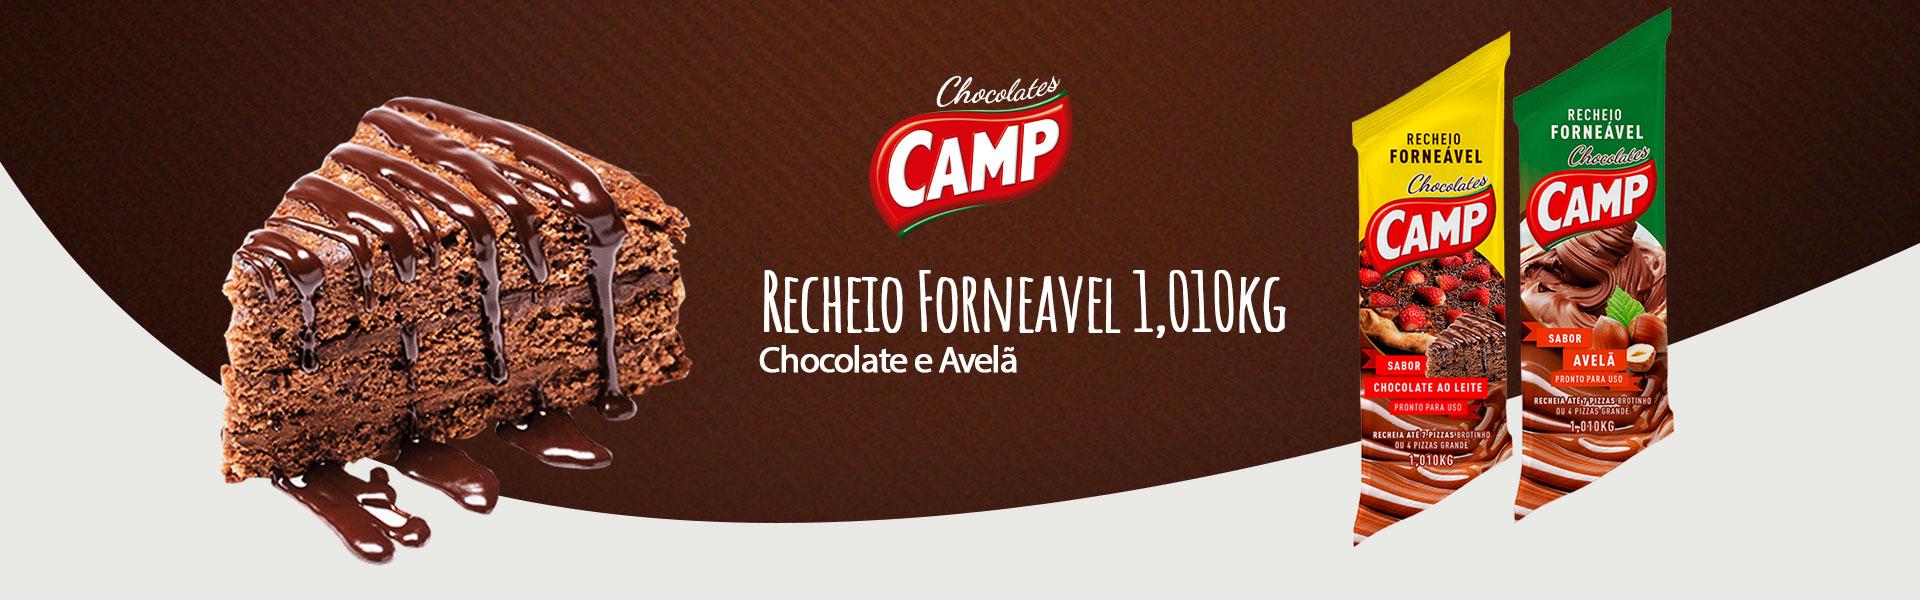 Camp Recheio Forne�vel